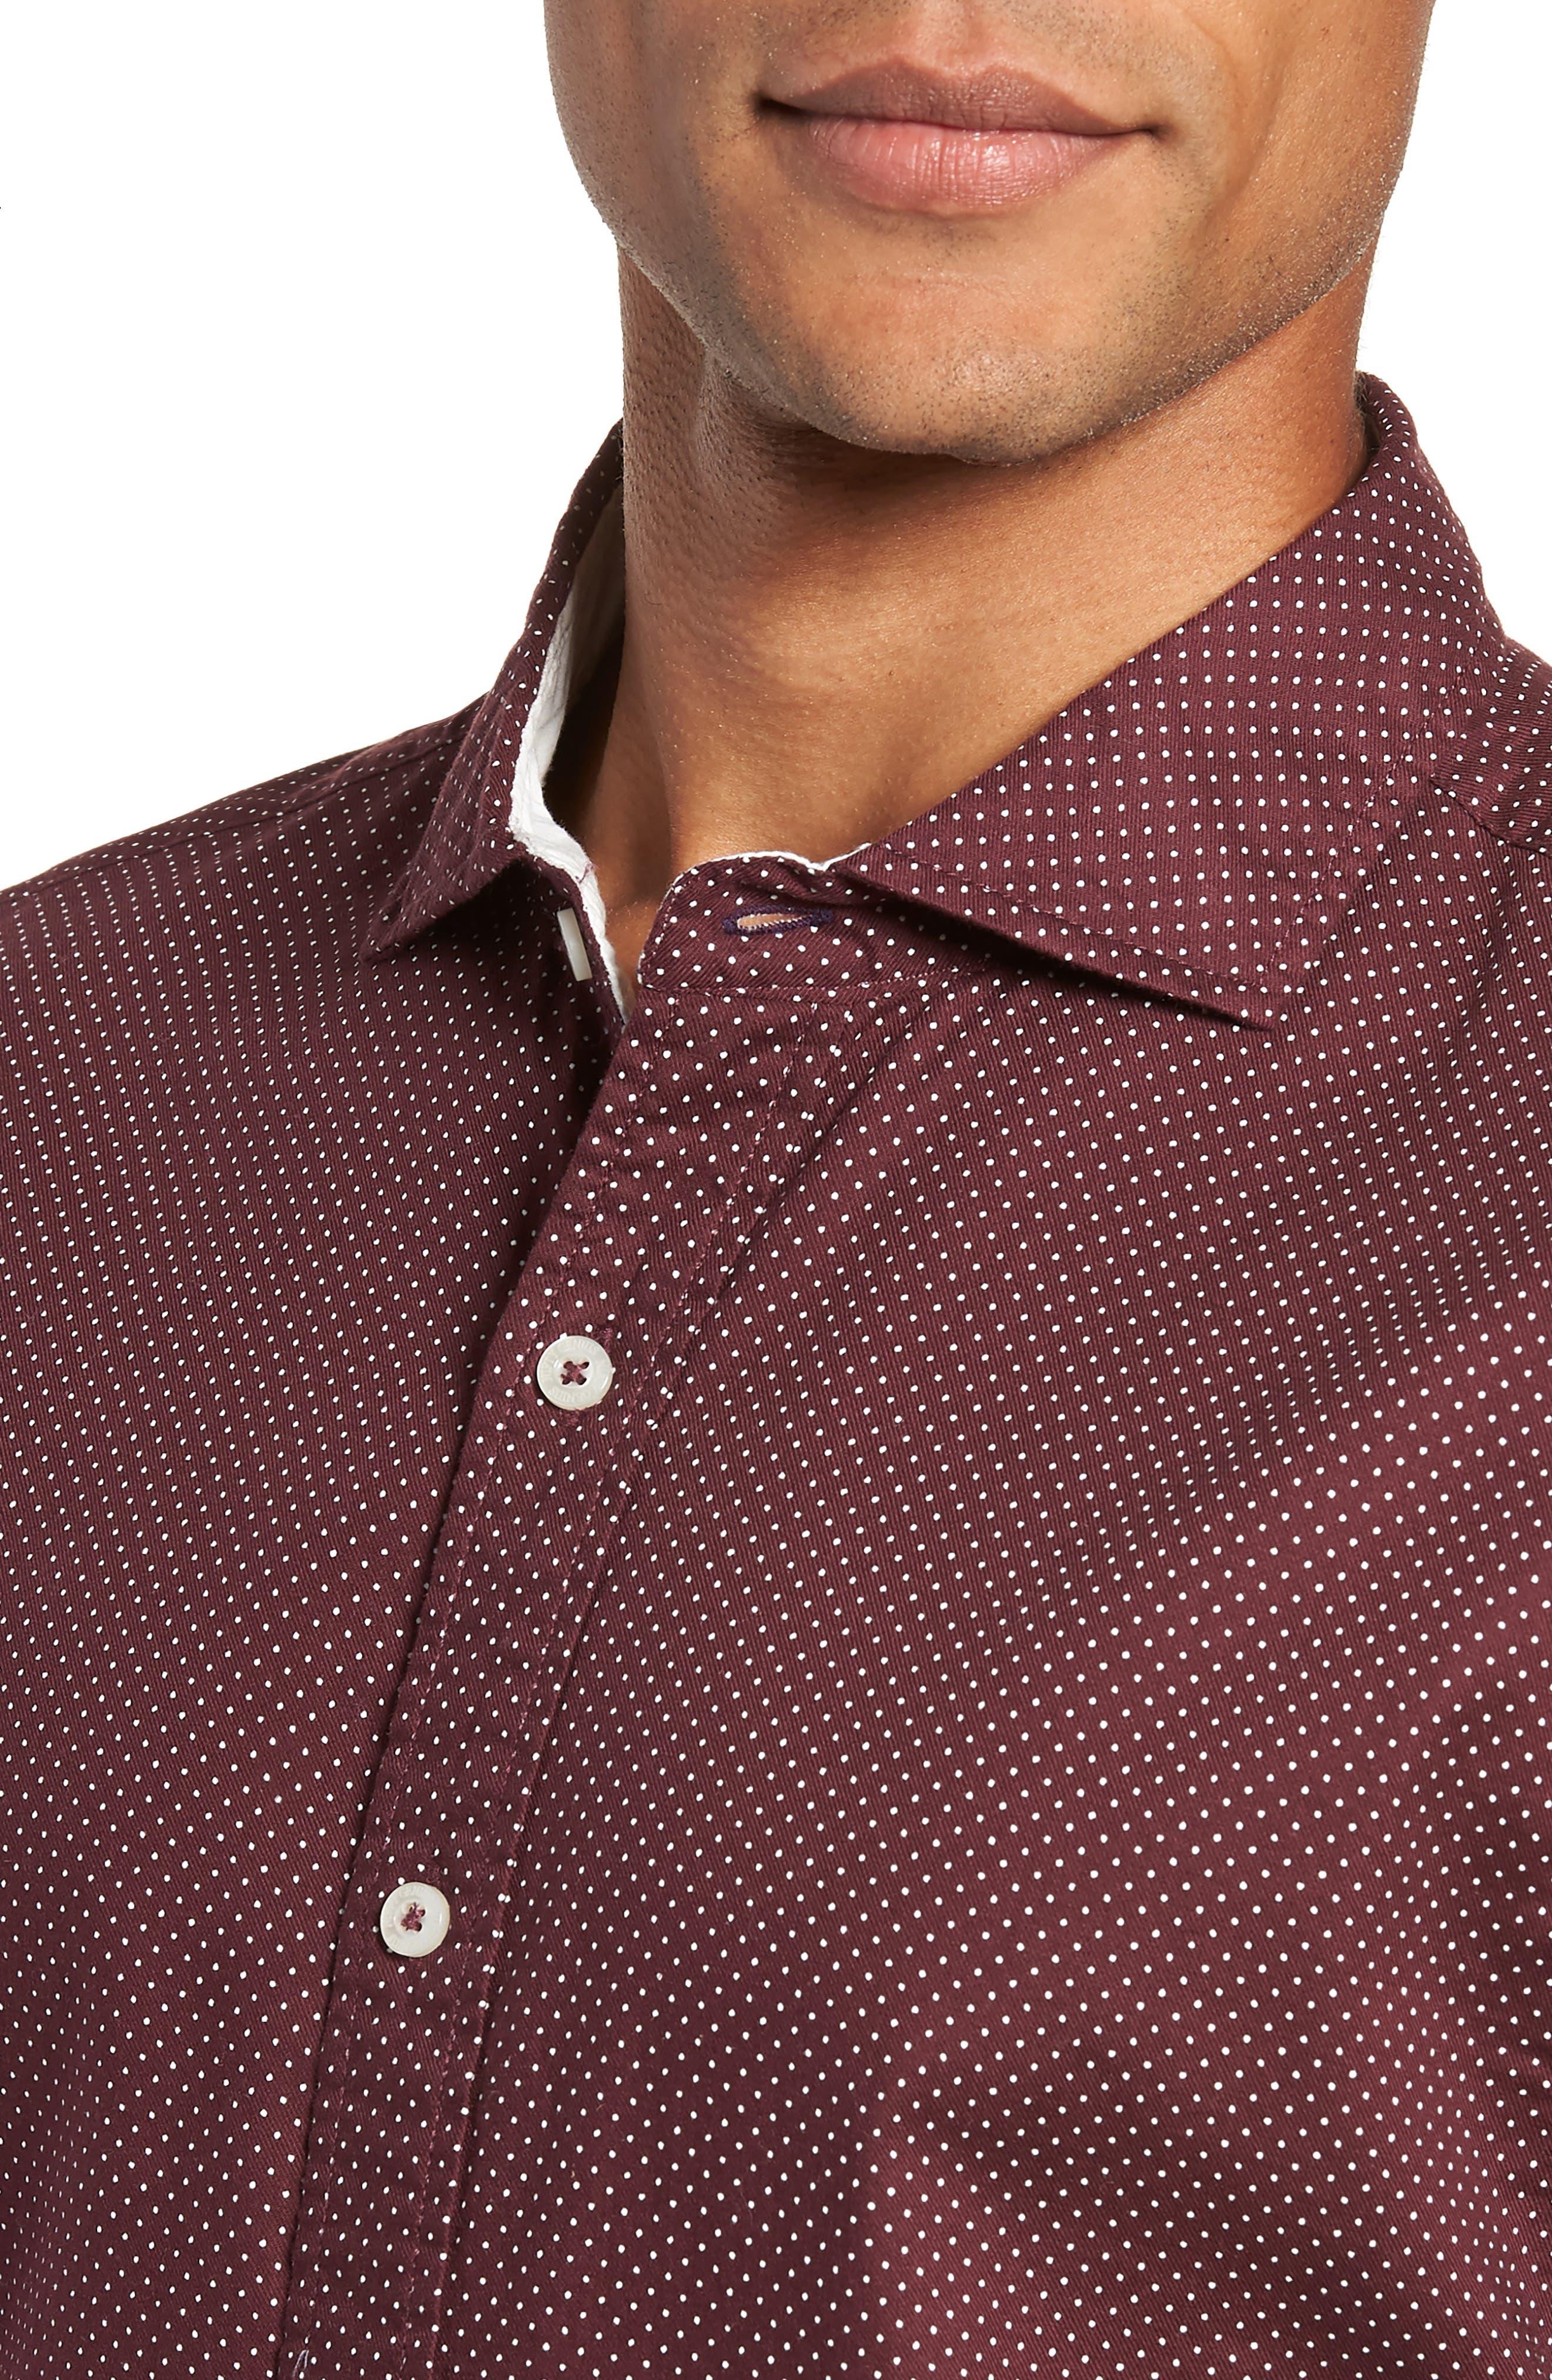 Earnest Regular Fit Dotted Sport Shirt,                             Alternate thumbnail 2, color,                             BURGUNDY